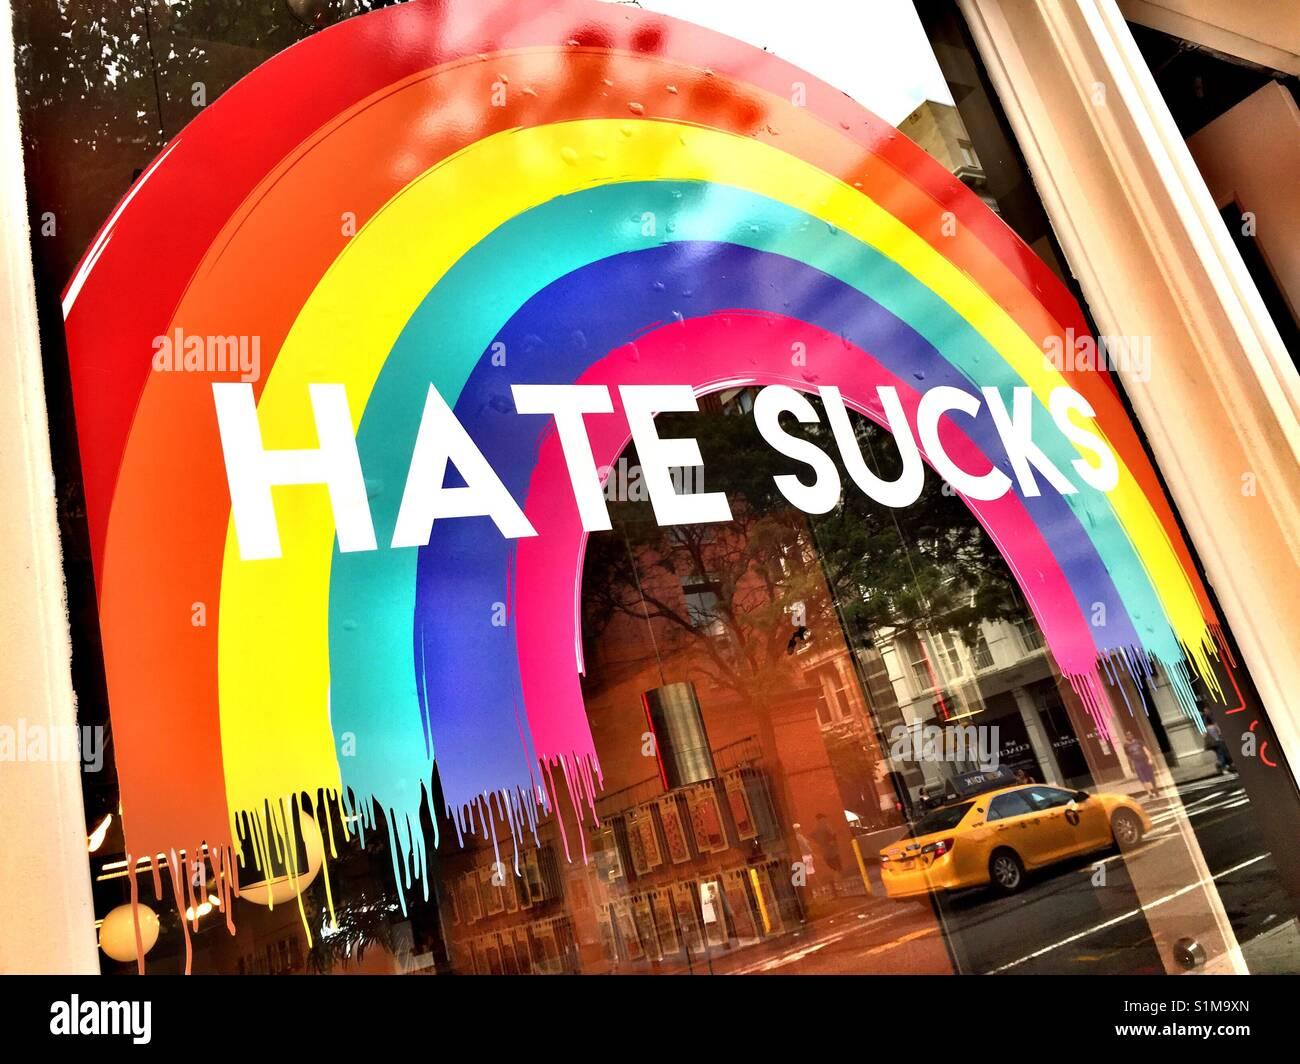 Suce la haine et la signe sur vitrine, NYC, USA Photo Stock